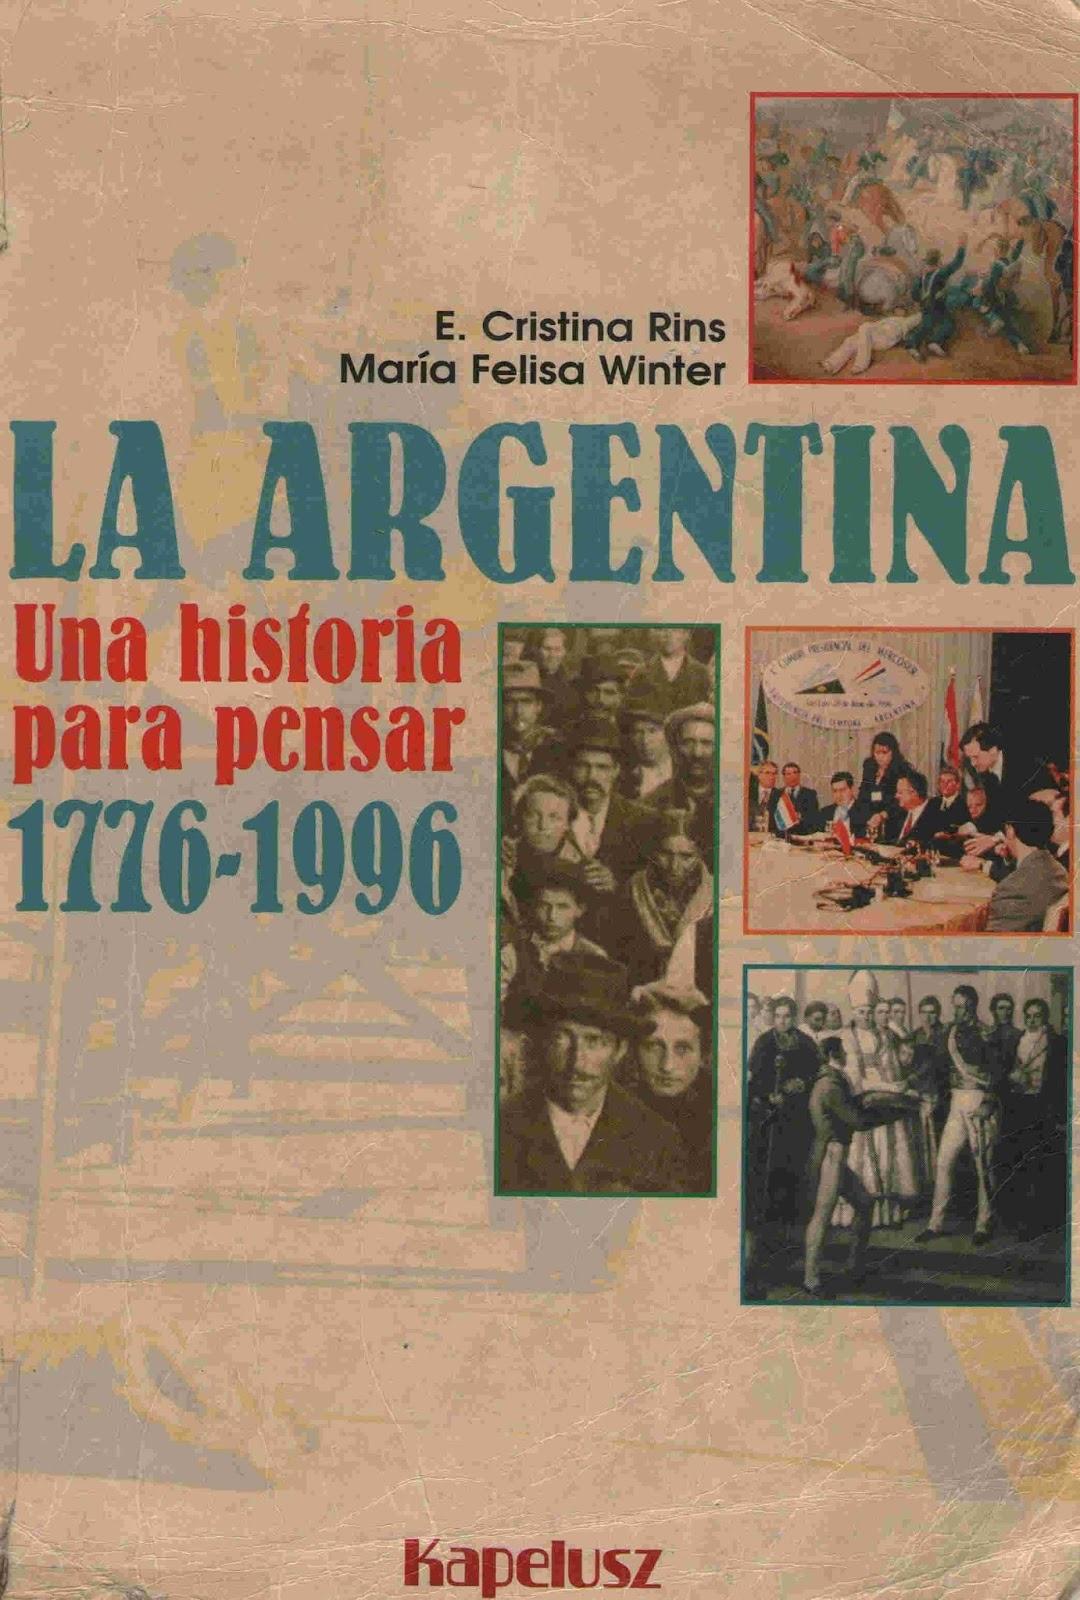 Libros Para Descargar: LA ARGENTINA - UNA HISTORIA PARA PENSAR 17761996 - KAPELUSZ @tataya.com.mx